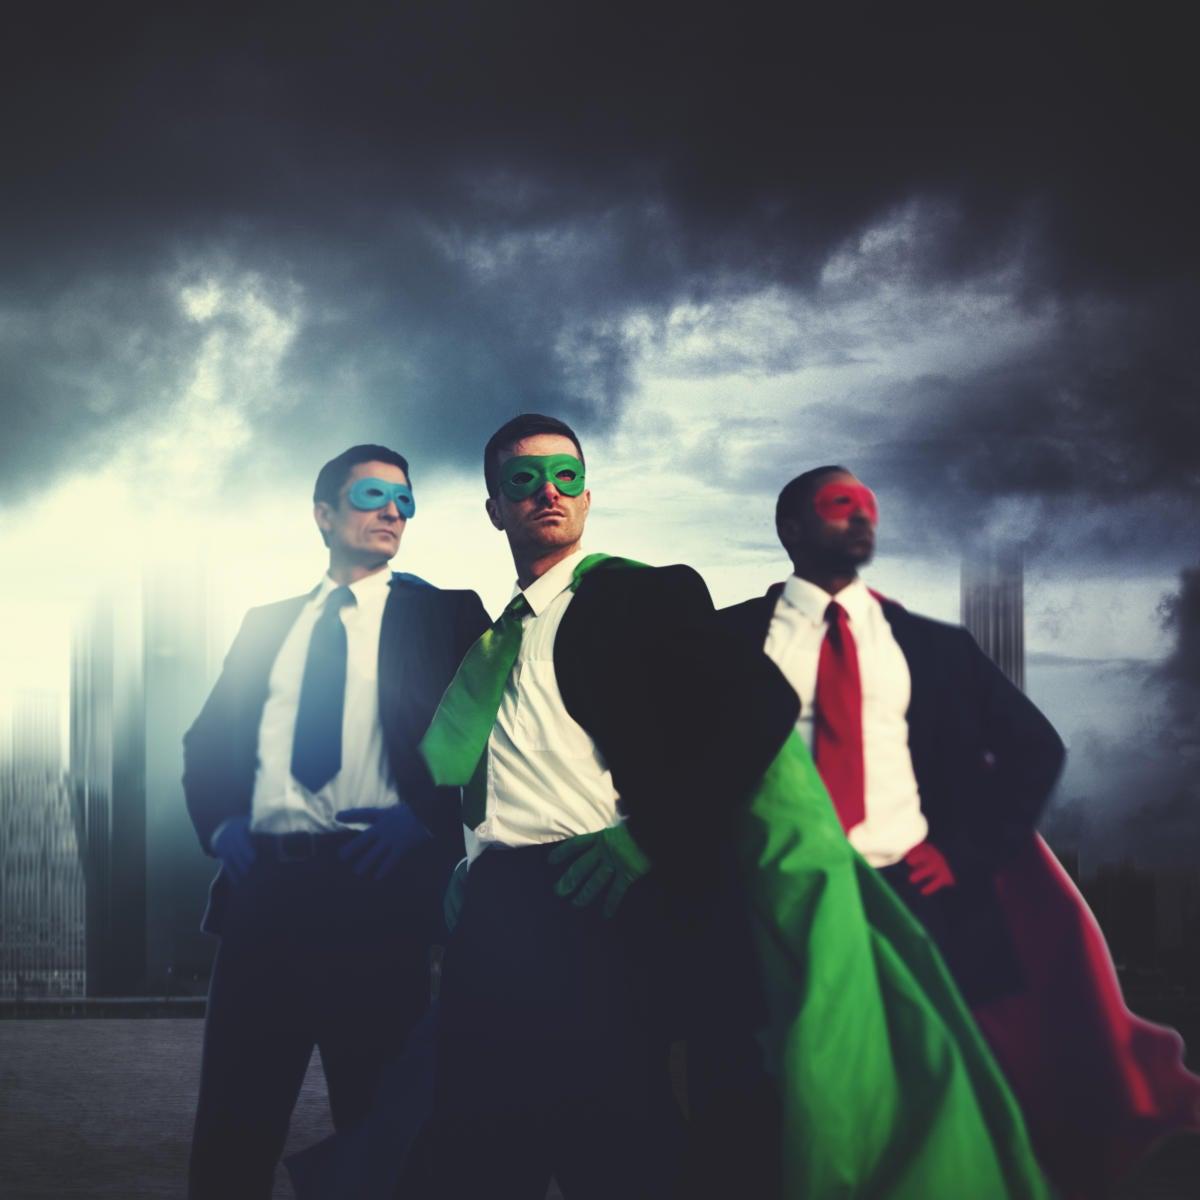 3 colorful superhero executives against cloudy sky